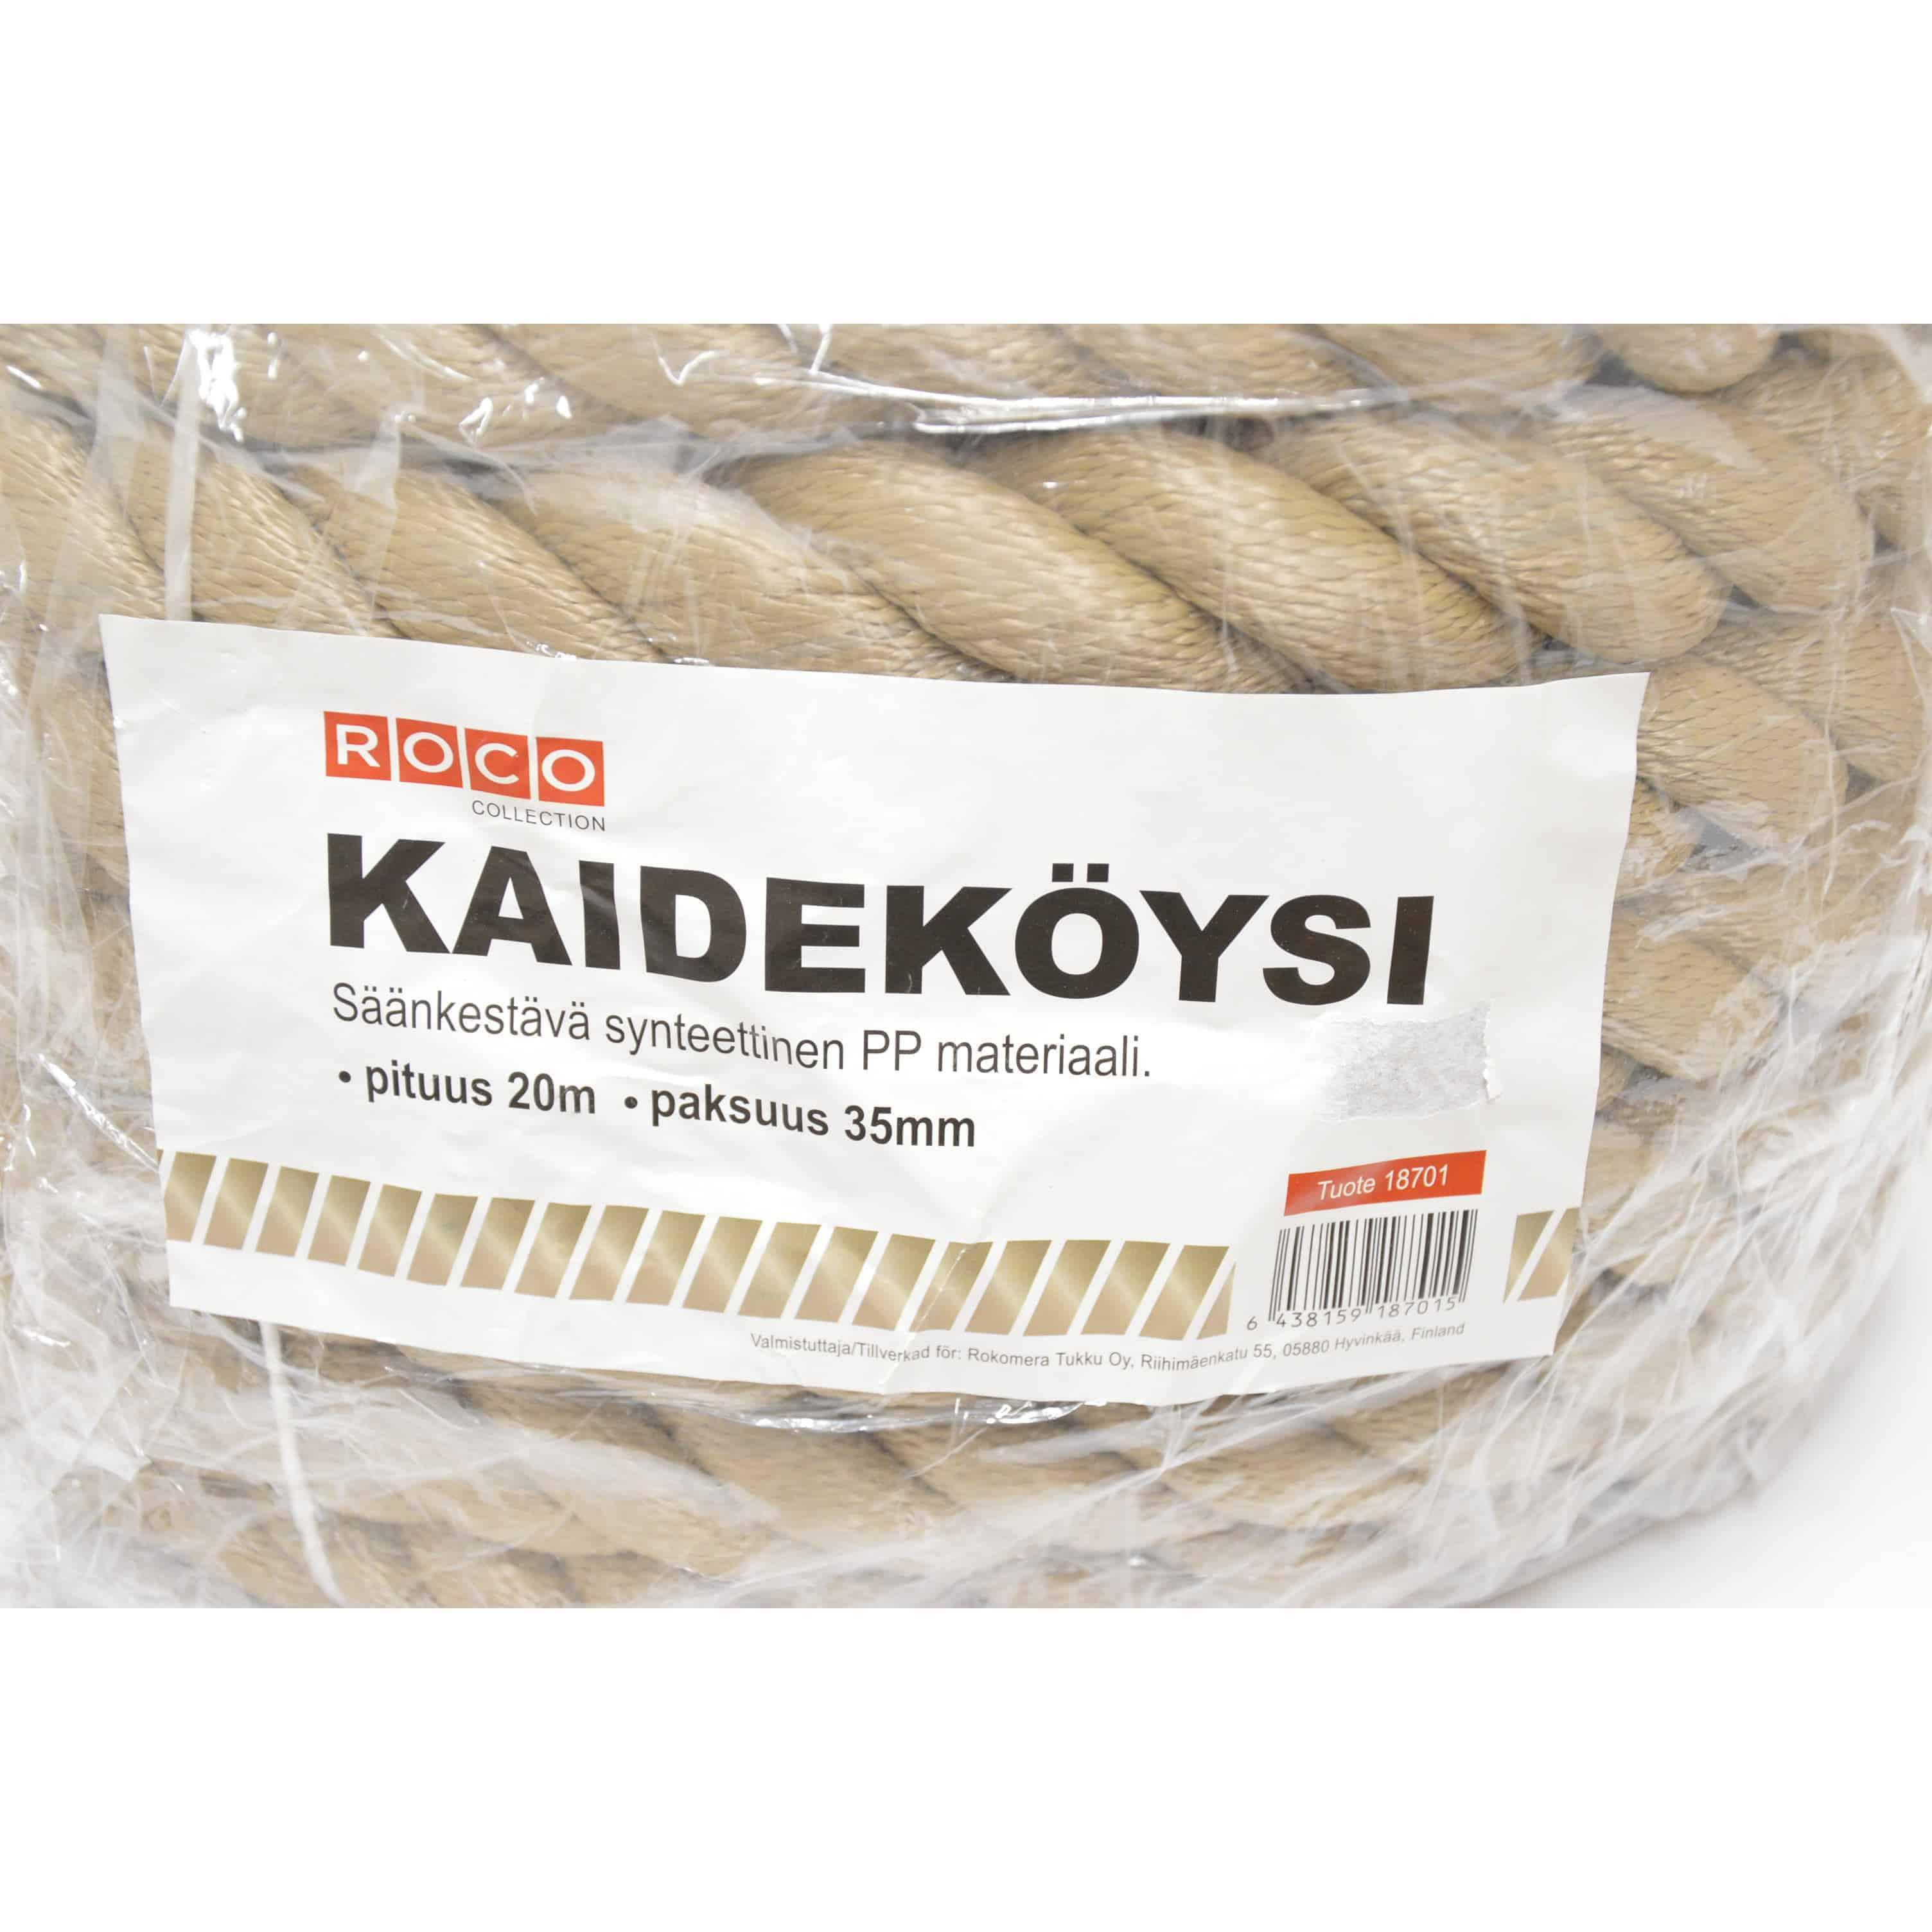 ROCO KAIDEKÖYSI 35MM 20M